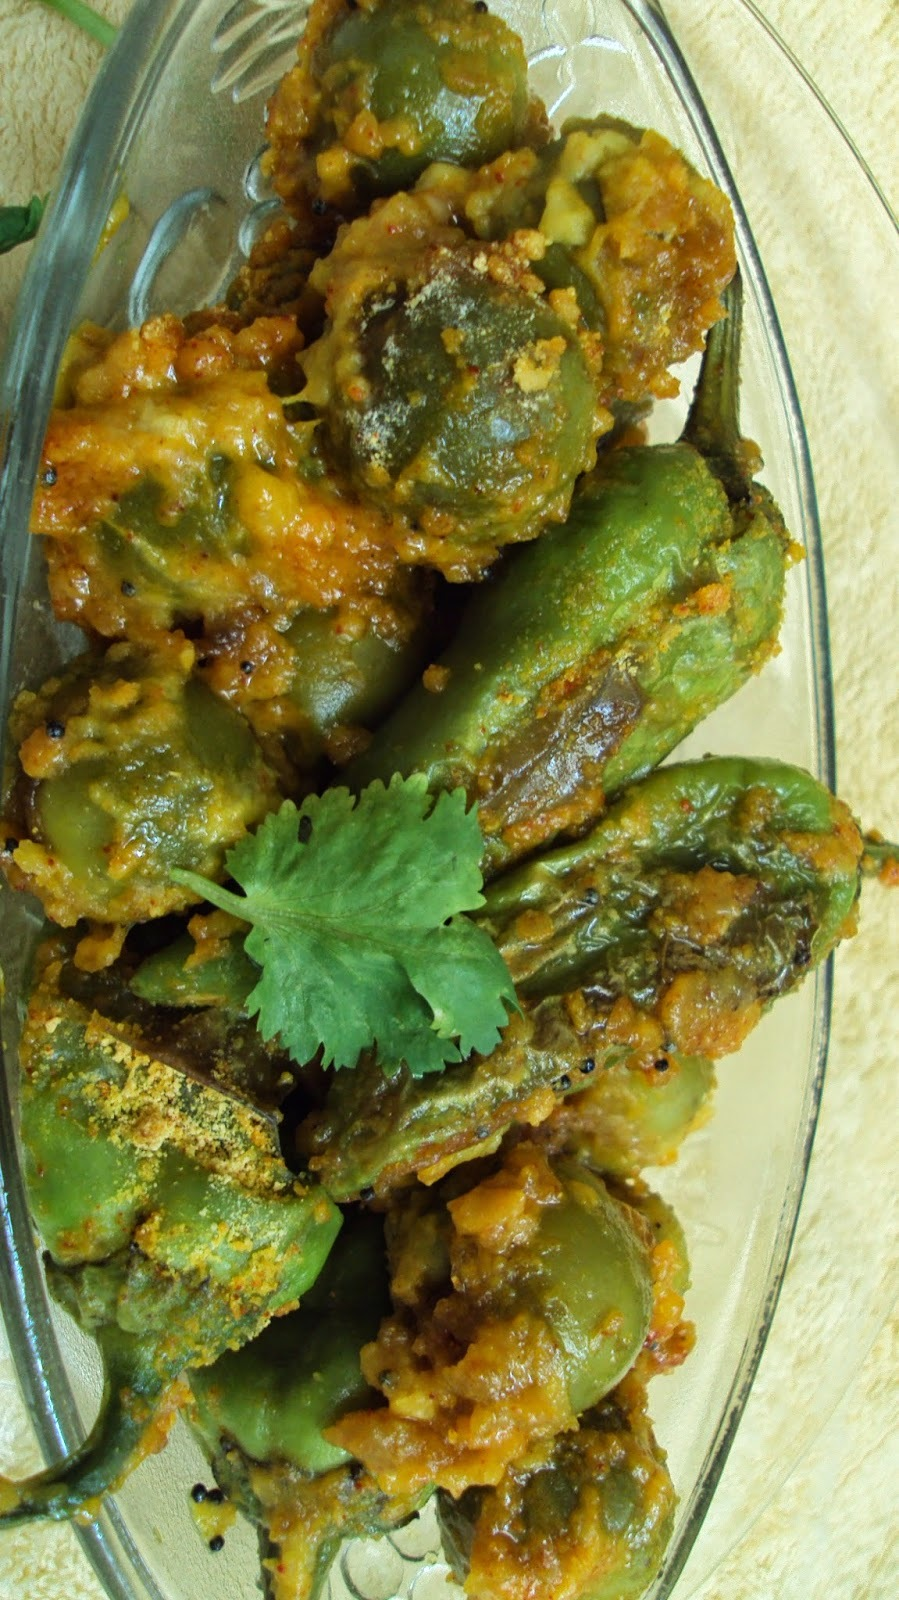 Recipe of Bharva Mirchi & Gunda | How to Make Stuffed Green Chilli & Fragrant Man Jack